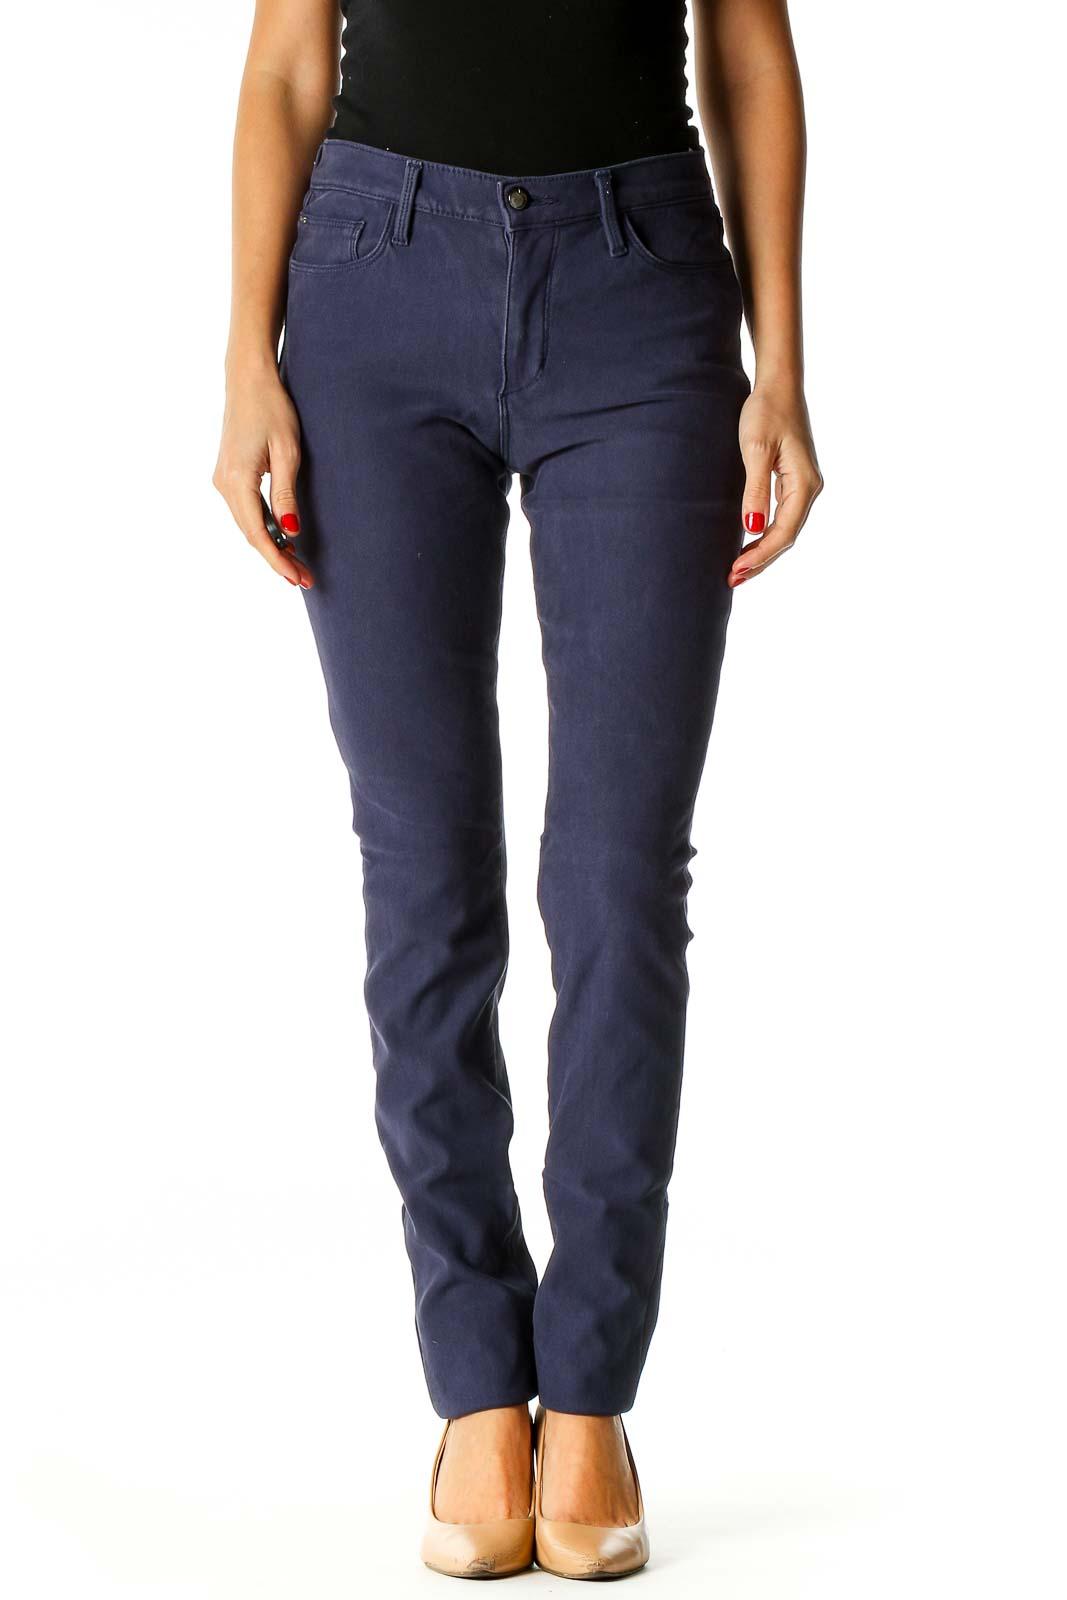 Purple Skinny Jeans Front